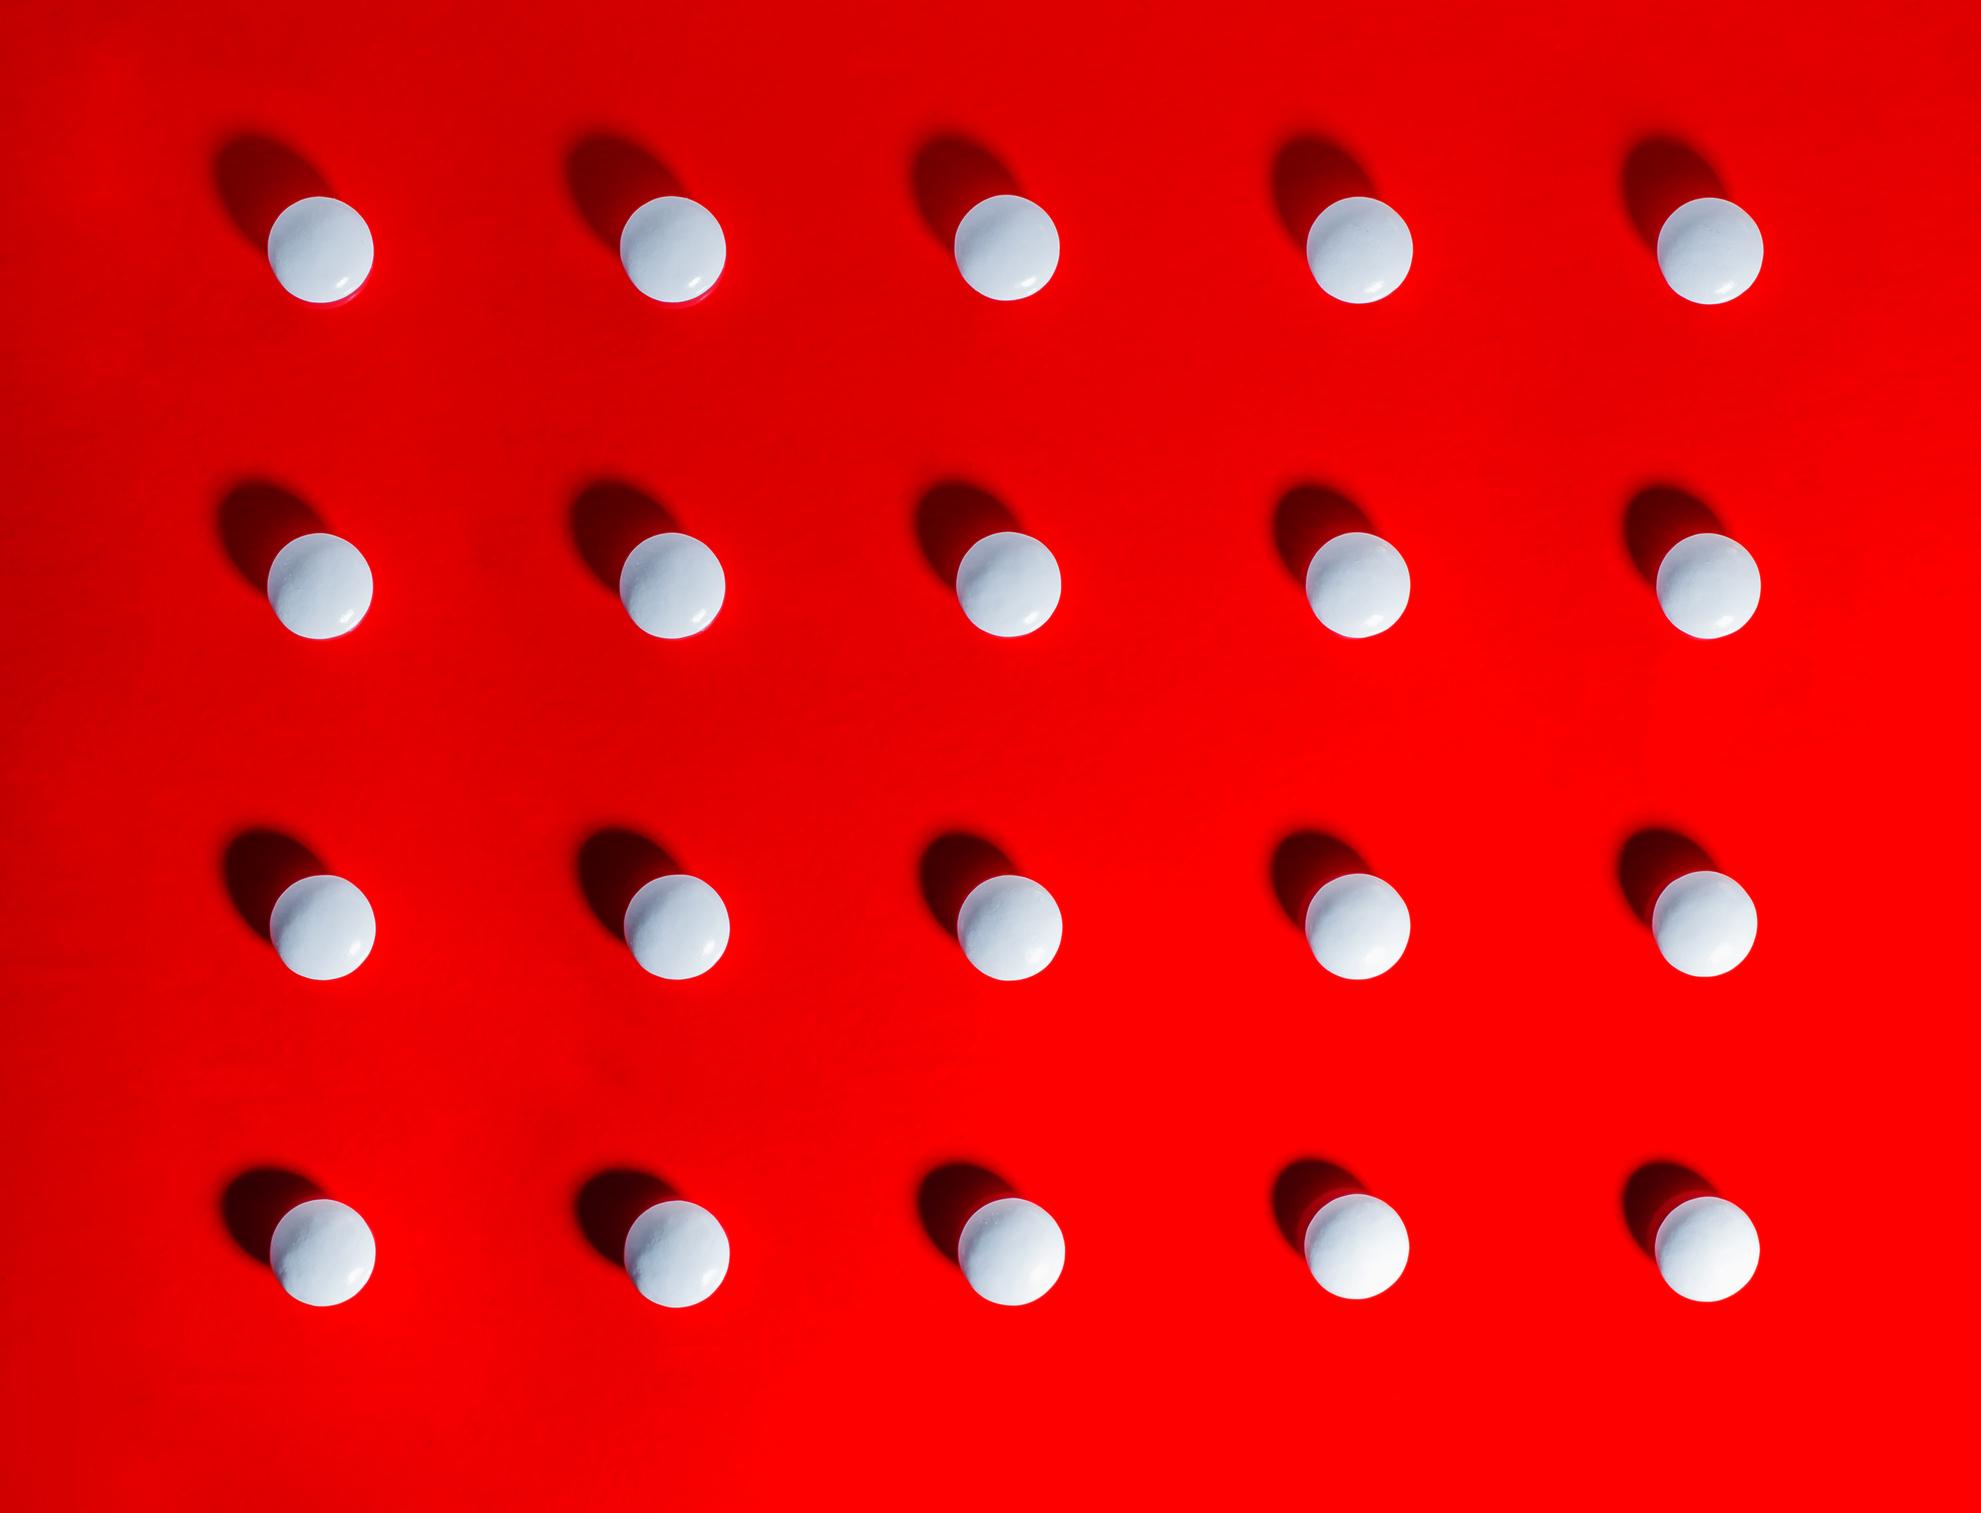 Vitamin D Pills Could Slow Progress of Type 2 Diabetes, Prediabetes, Scientists Say - Newsweek thumbnail